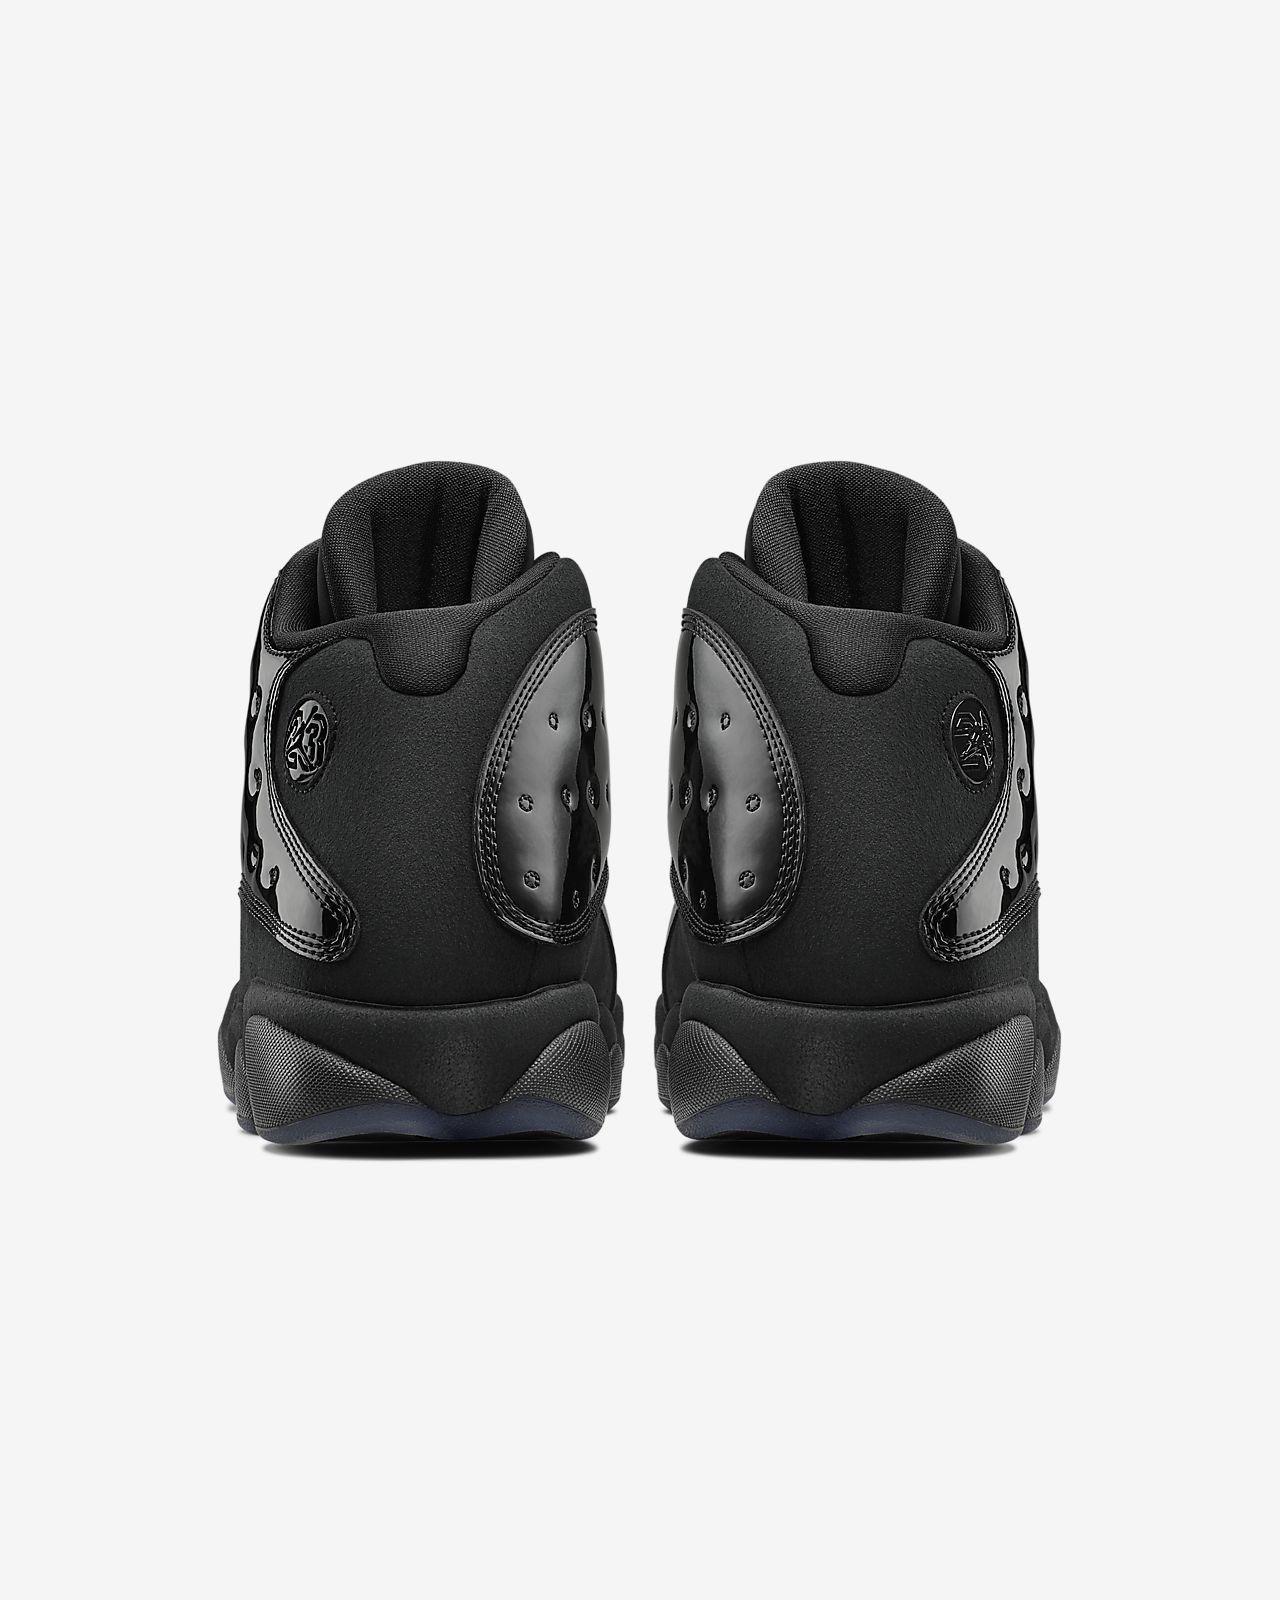 1193b672f611 Air Jordan 13 Retro Men s Shoe. Nike.com